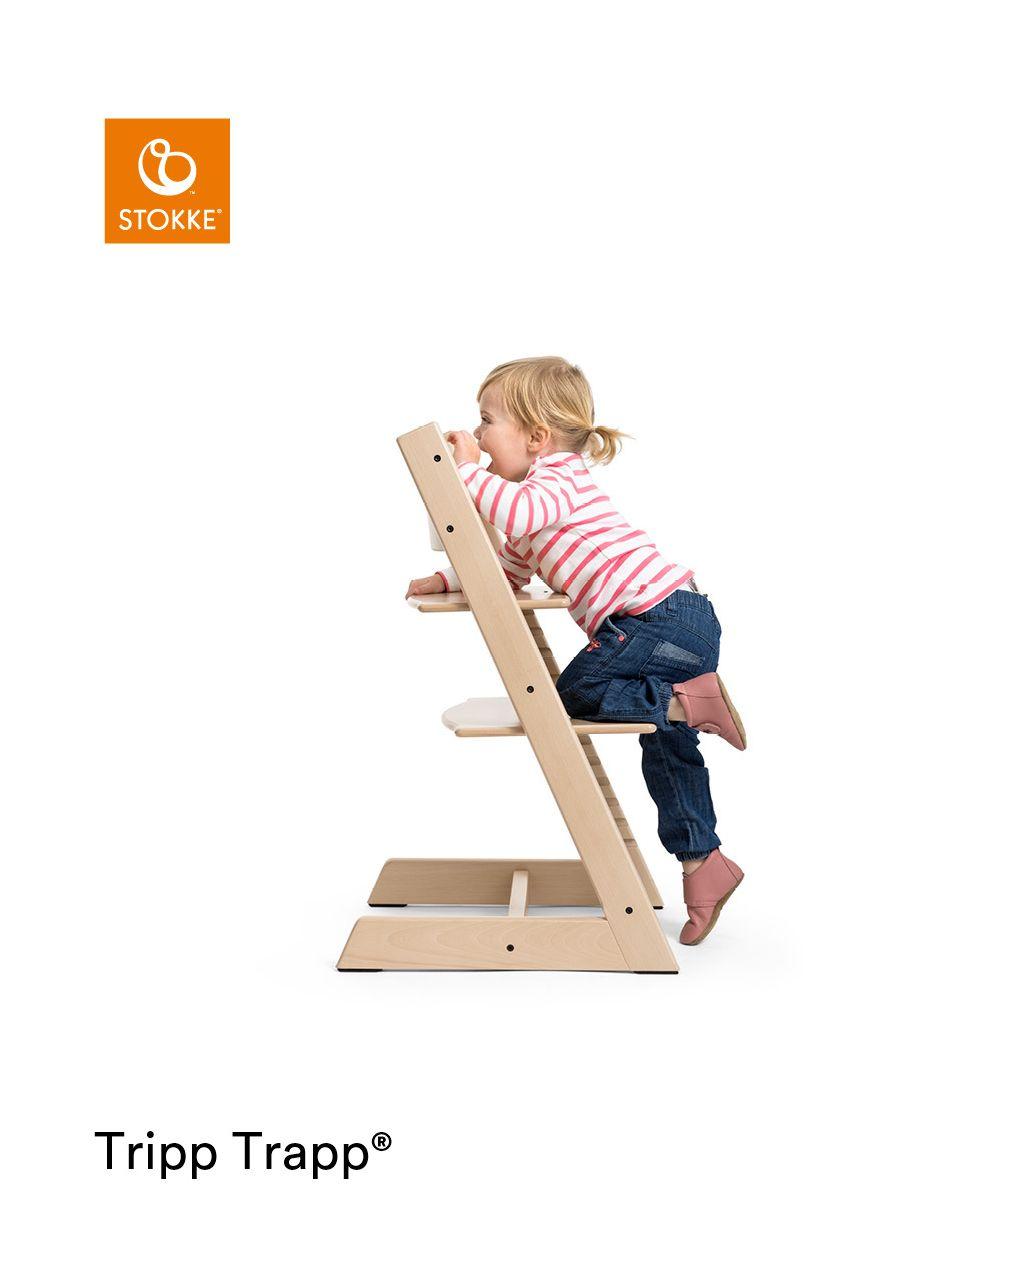 Tripp trapp® - sbiancato - Stokke